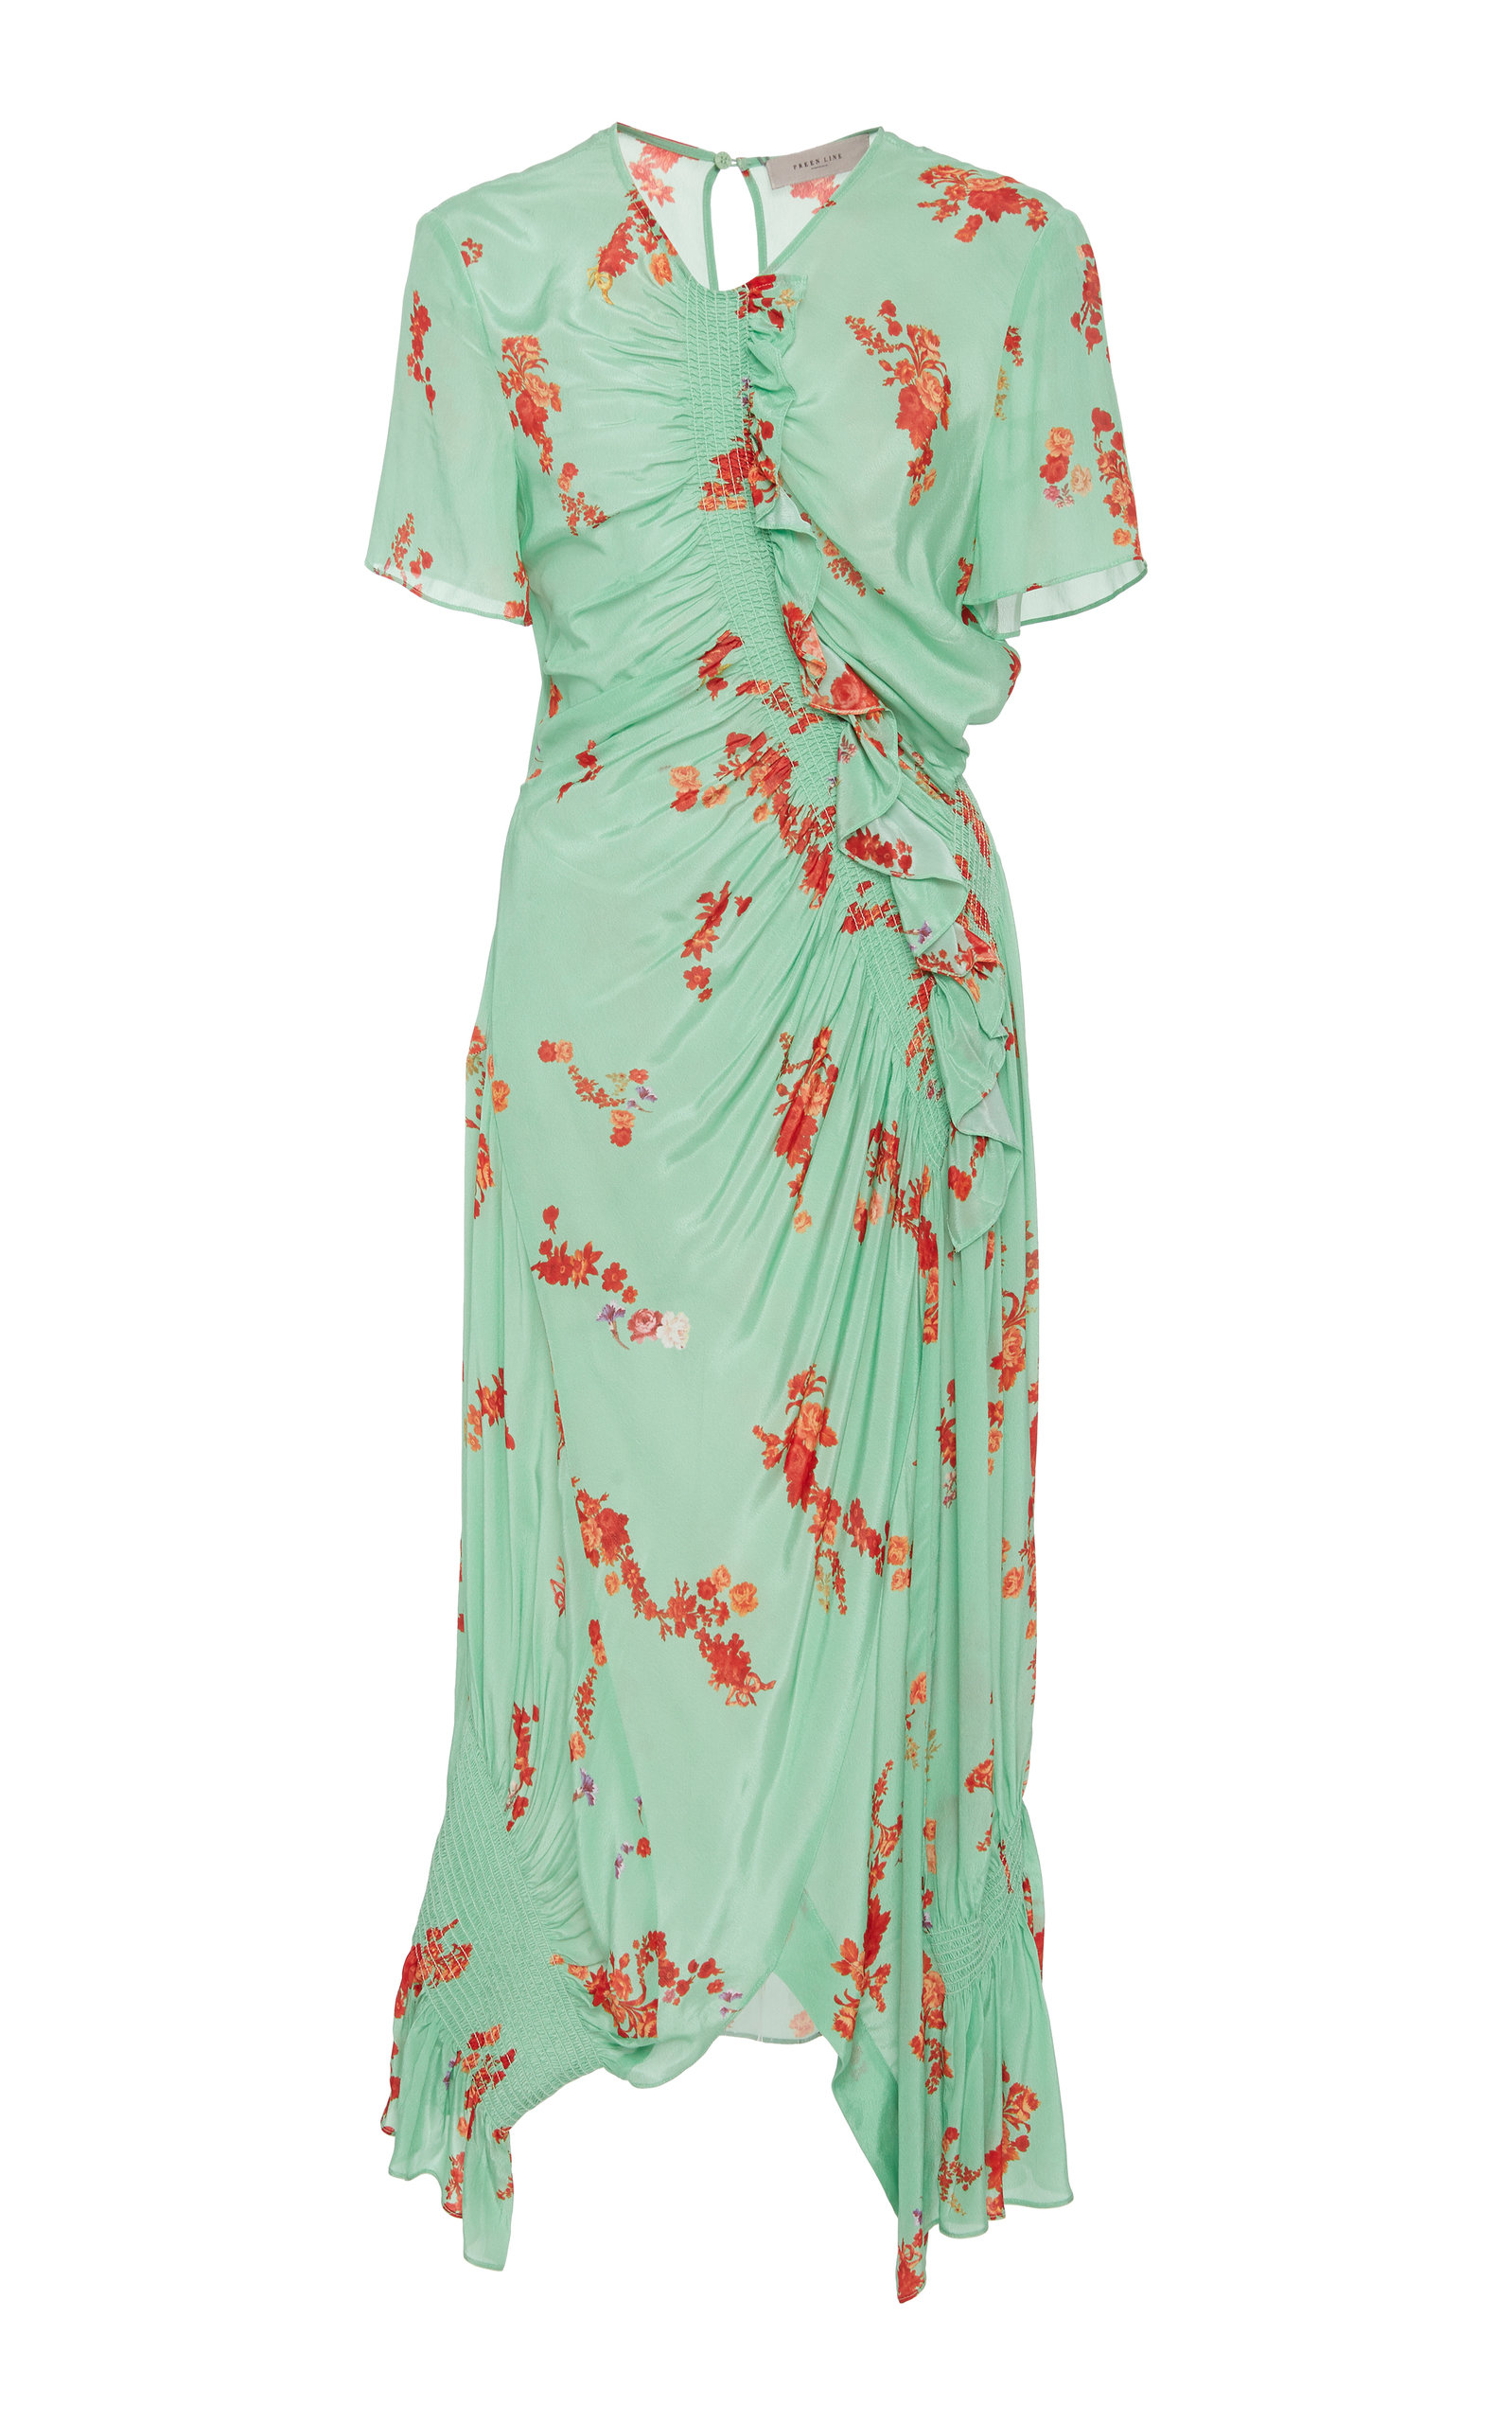 Serelida Shirred Floral Print Midi Dress by Preen Line